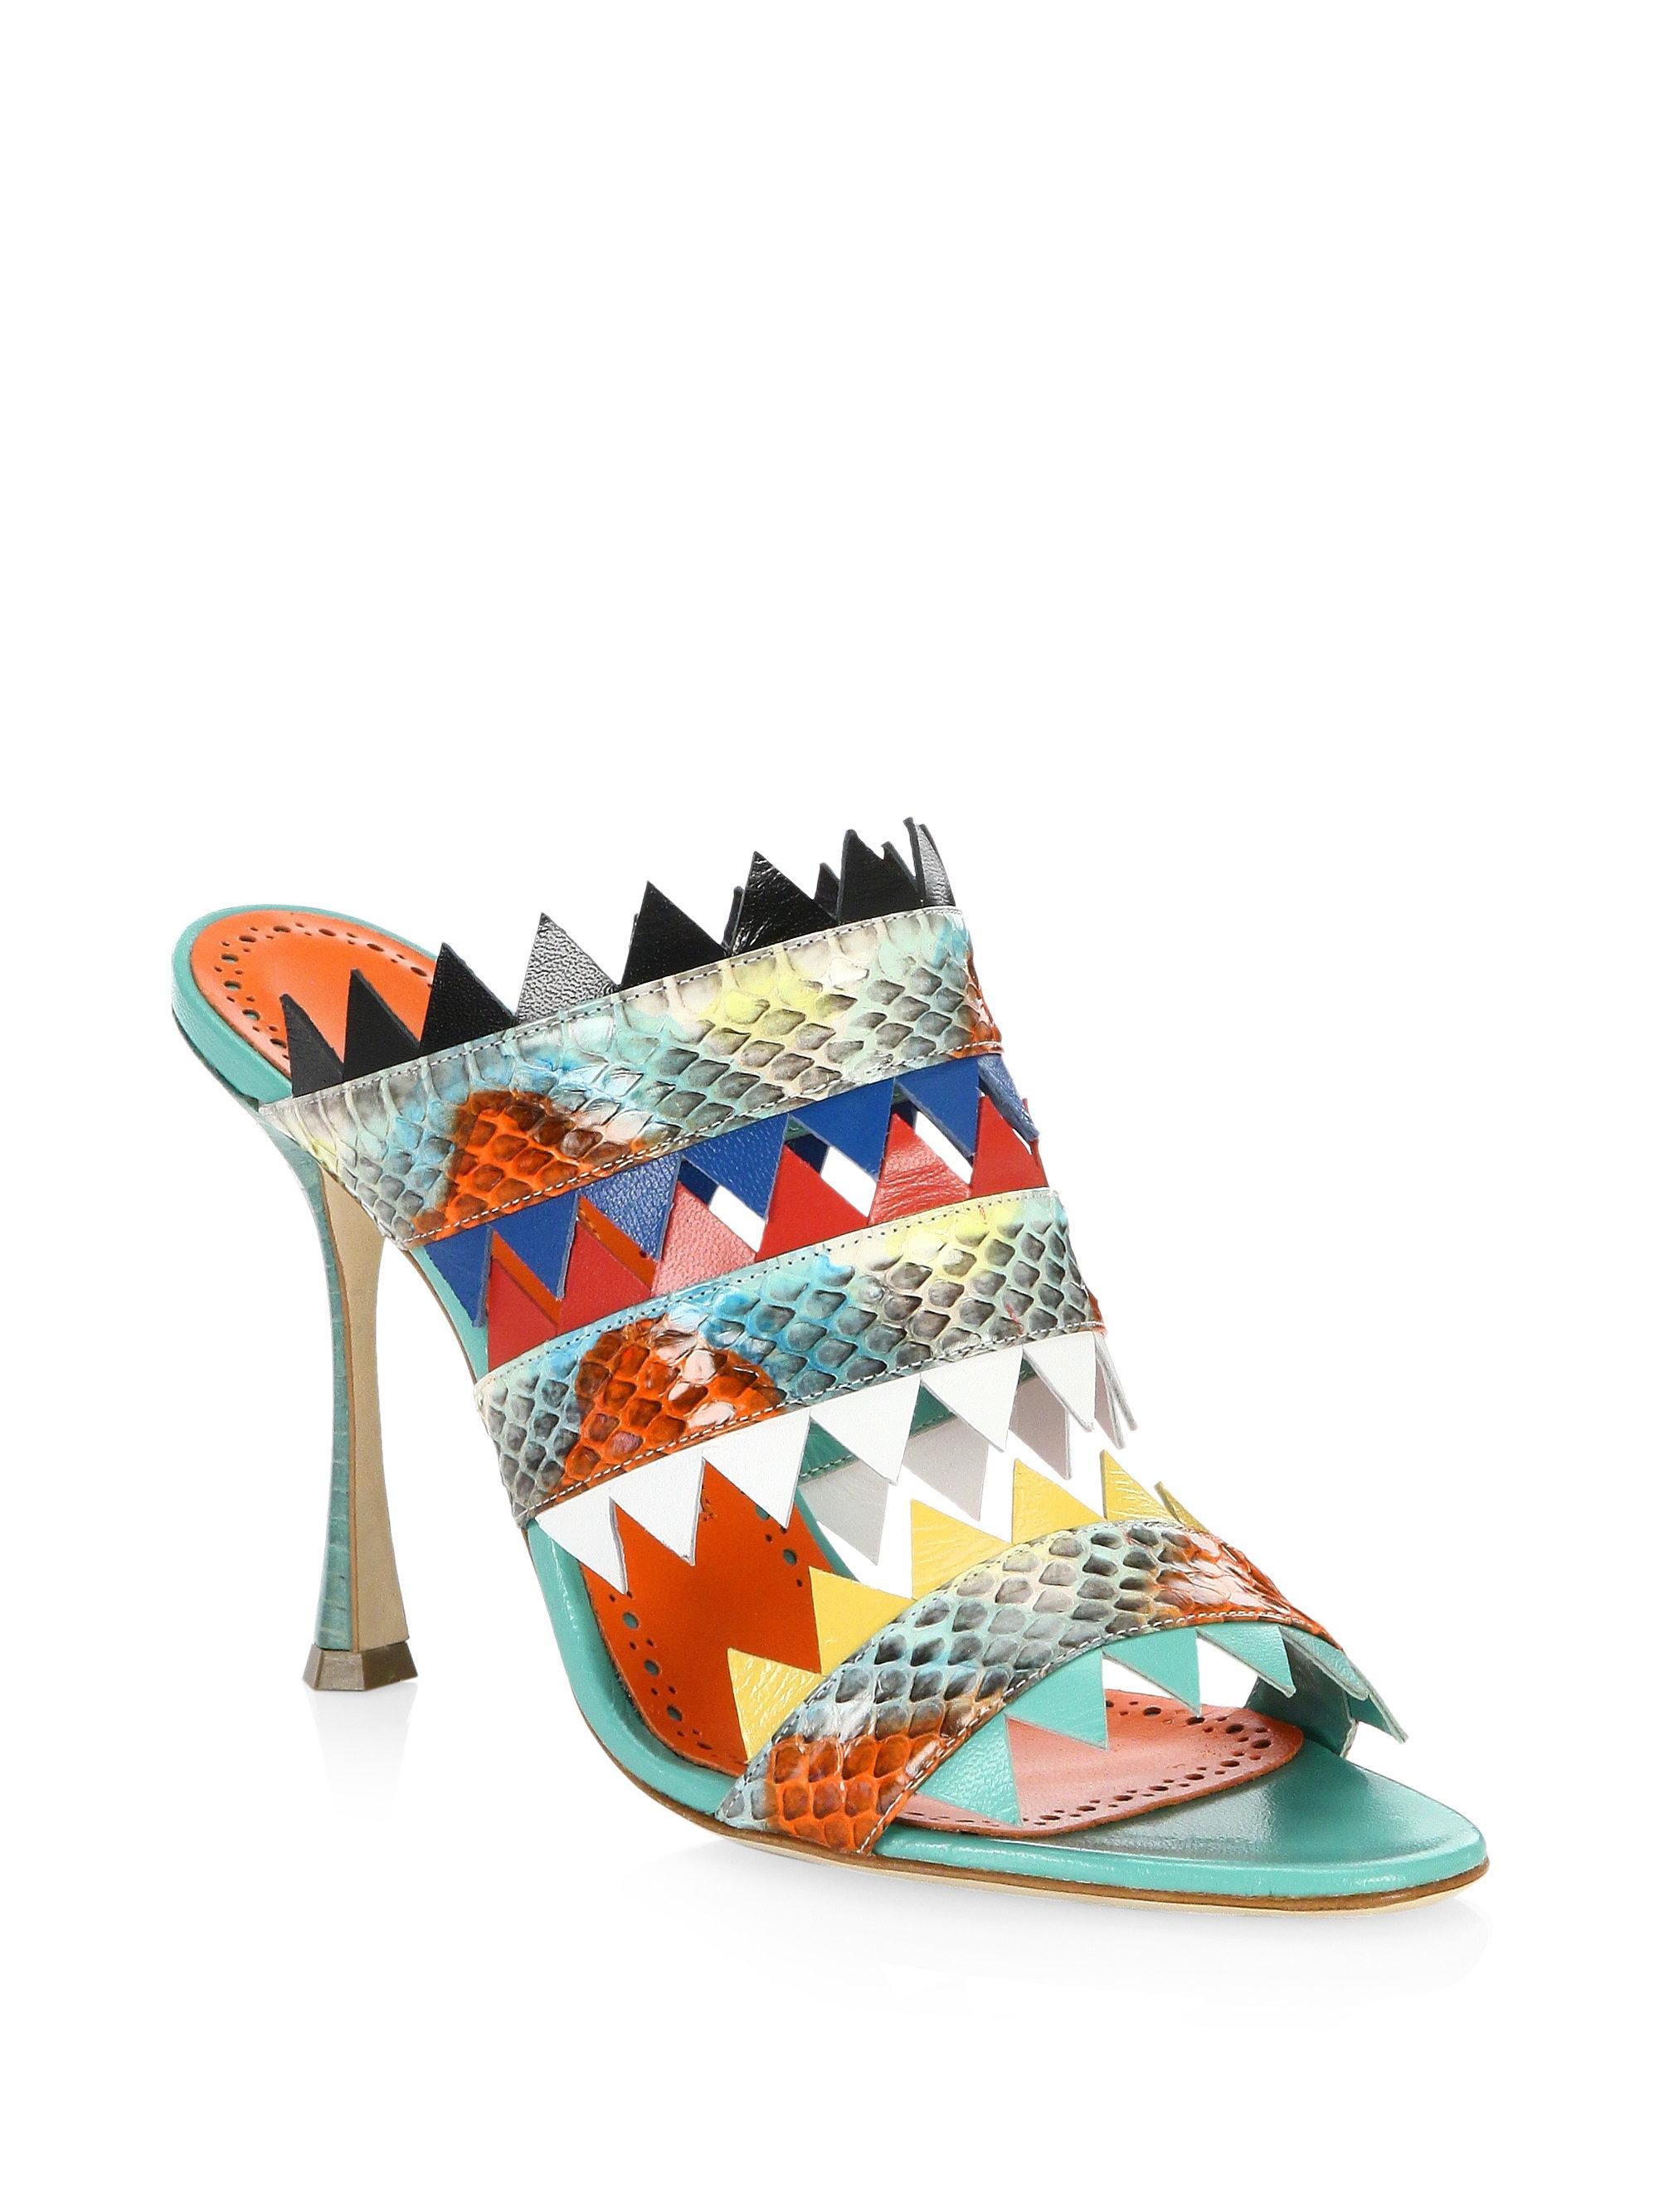 multi coloured Arpege 105 snakeskin sandals - Multicolour Manolo Blahnik 9YQjRoL